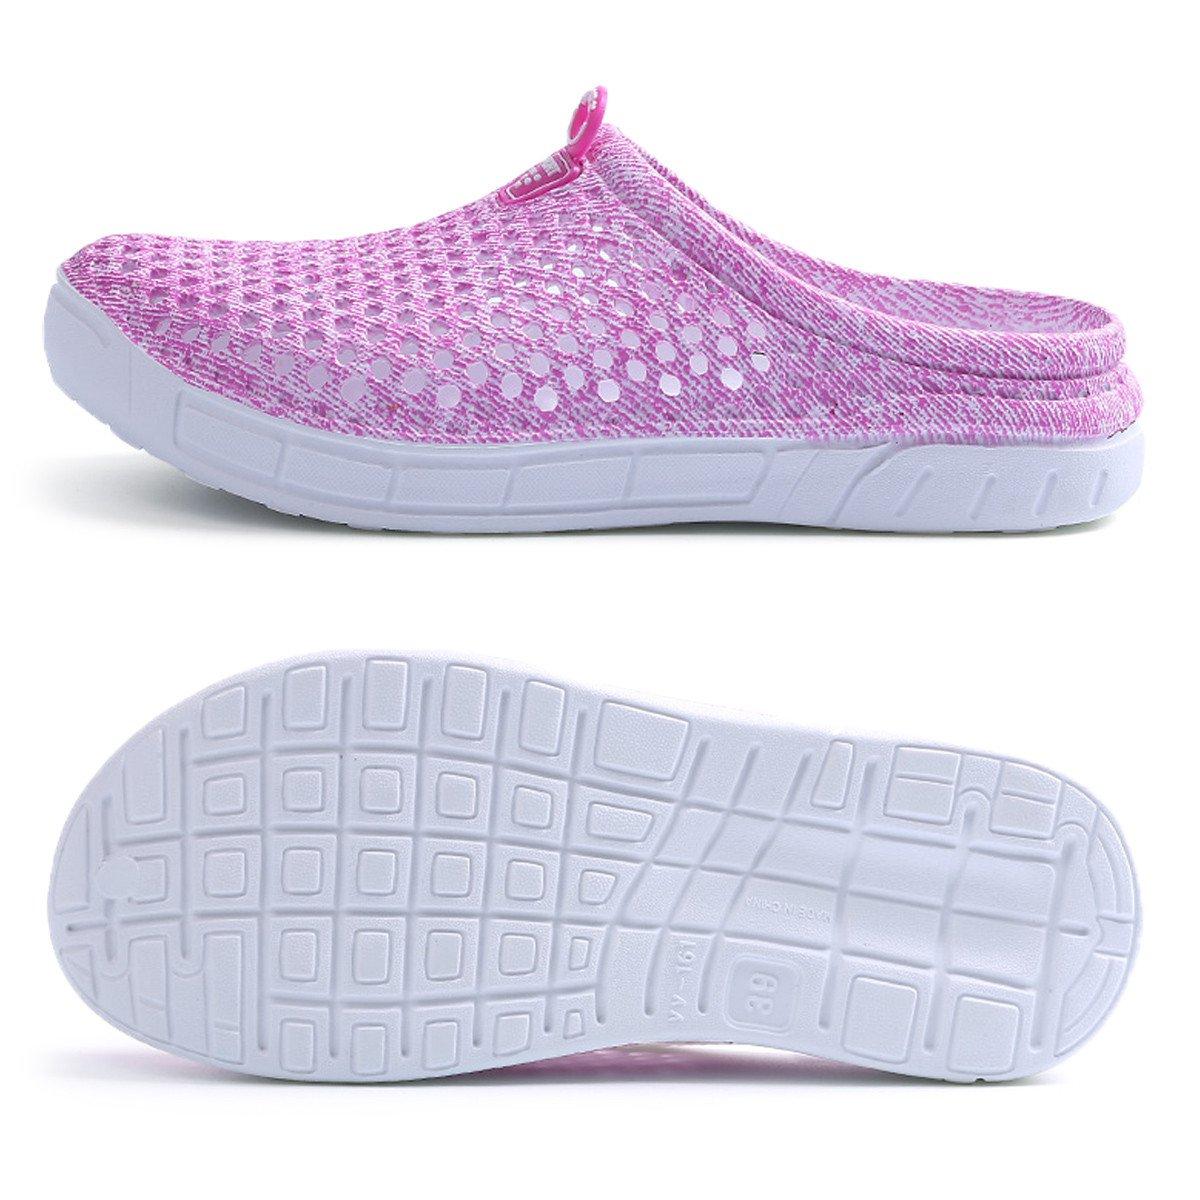 Ginjang Women's Garden Clogs Shoes Slip-on Slippers Sandals(39/Pink) by Ginjang (Image #2)